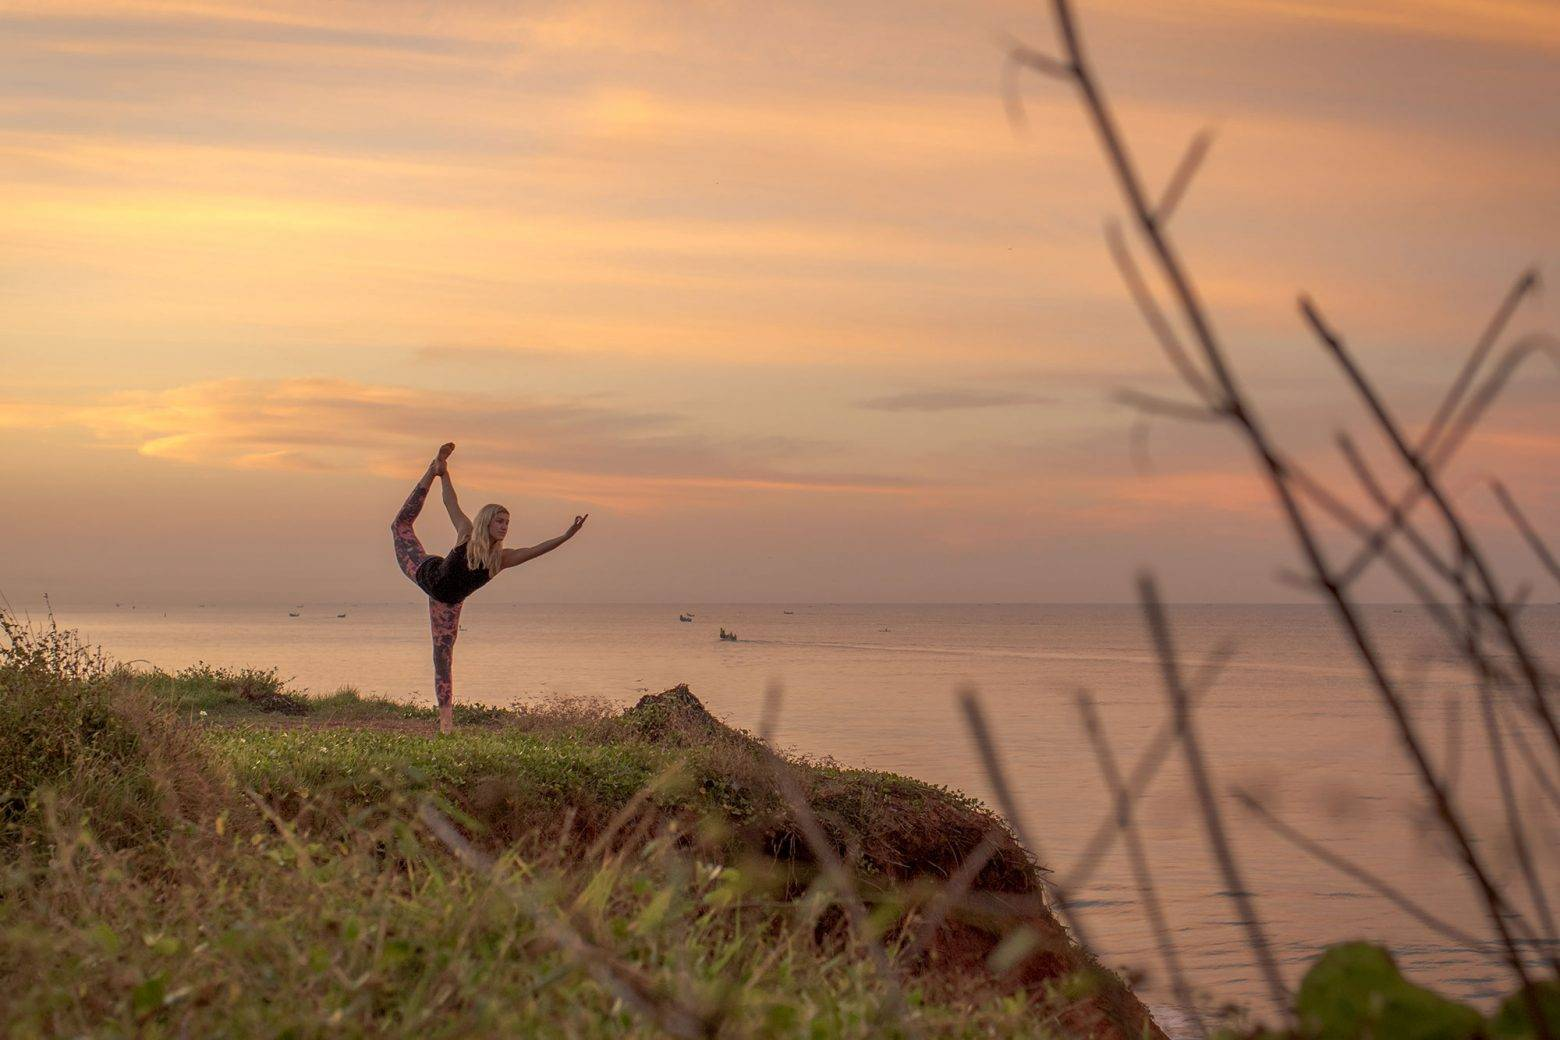 https://www.soulandsurf.com/wp-content/uploads/2021/04/indiayogadancers-pose-on-the-cliff-e1627563226204.jpg Image